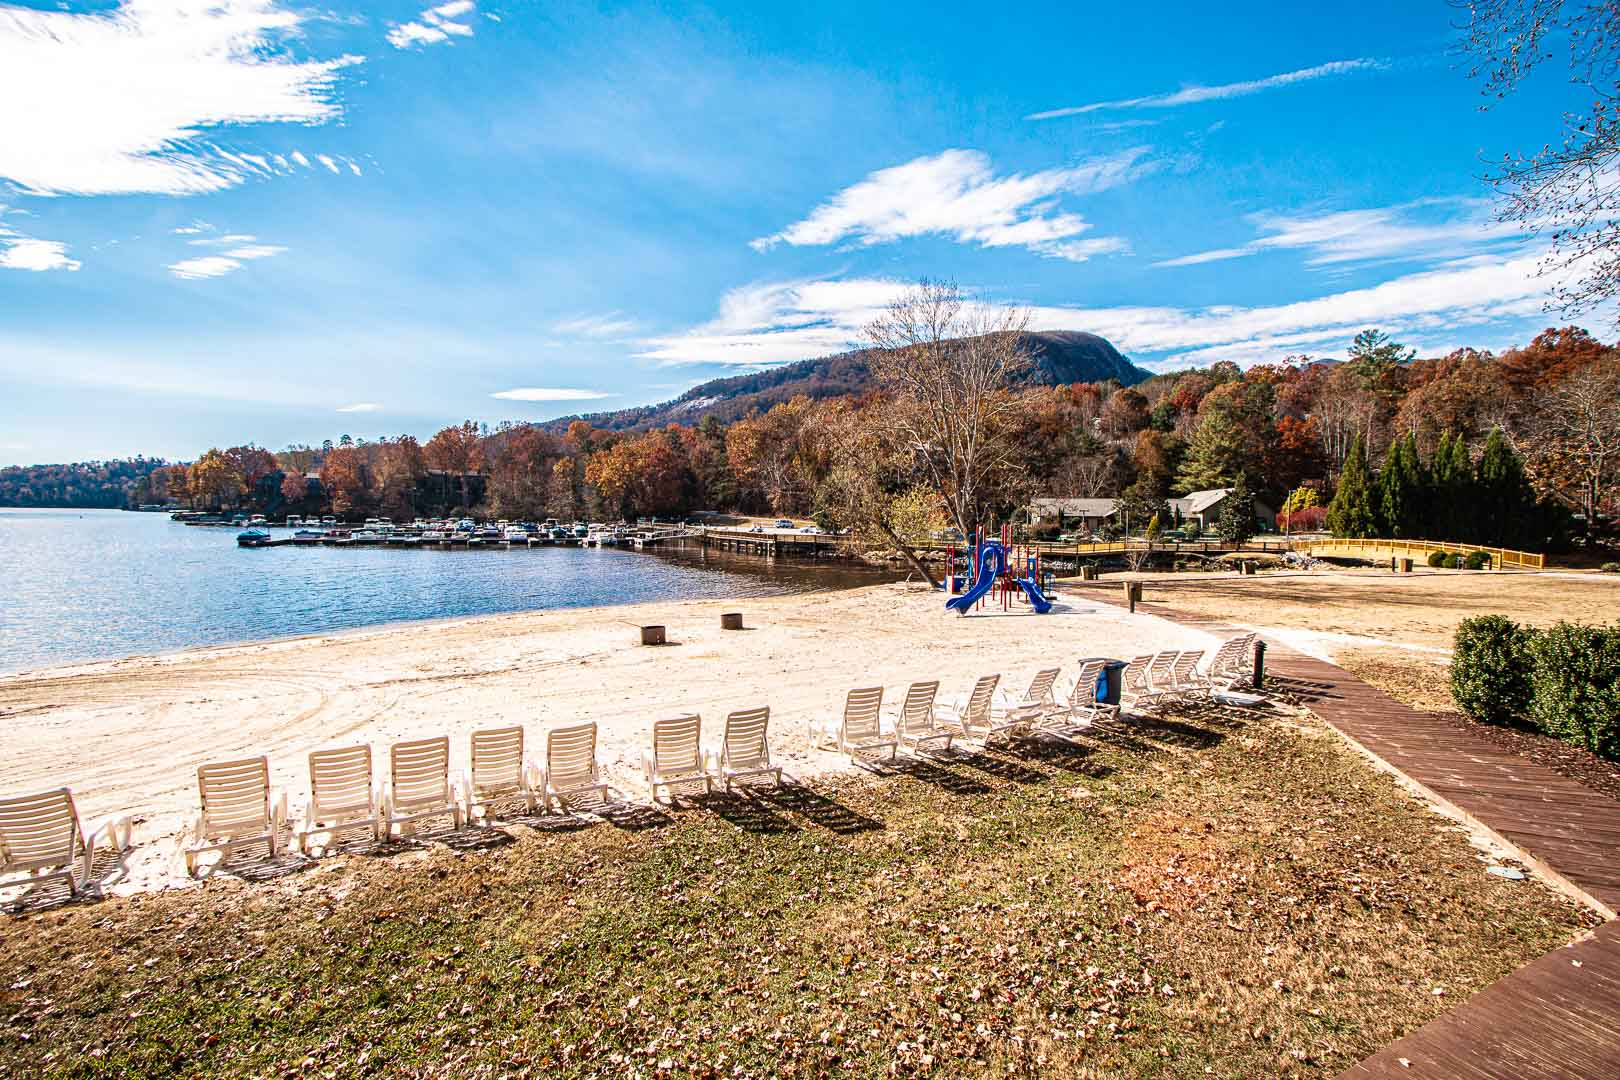 A scenic lake view at VRI's Mountain Loft Resort in North Carolina.